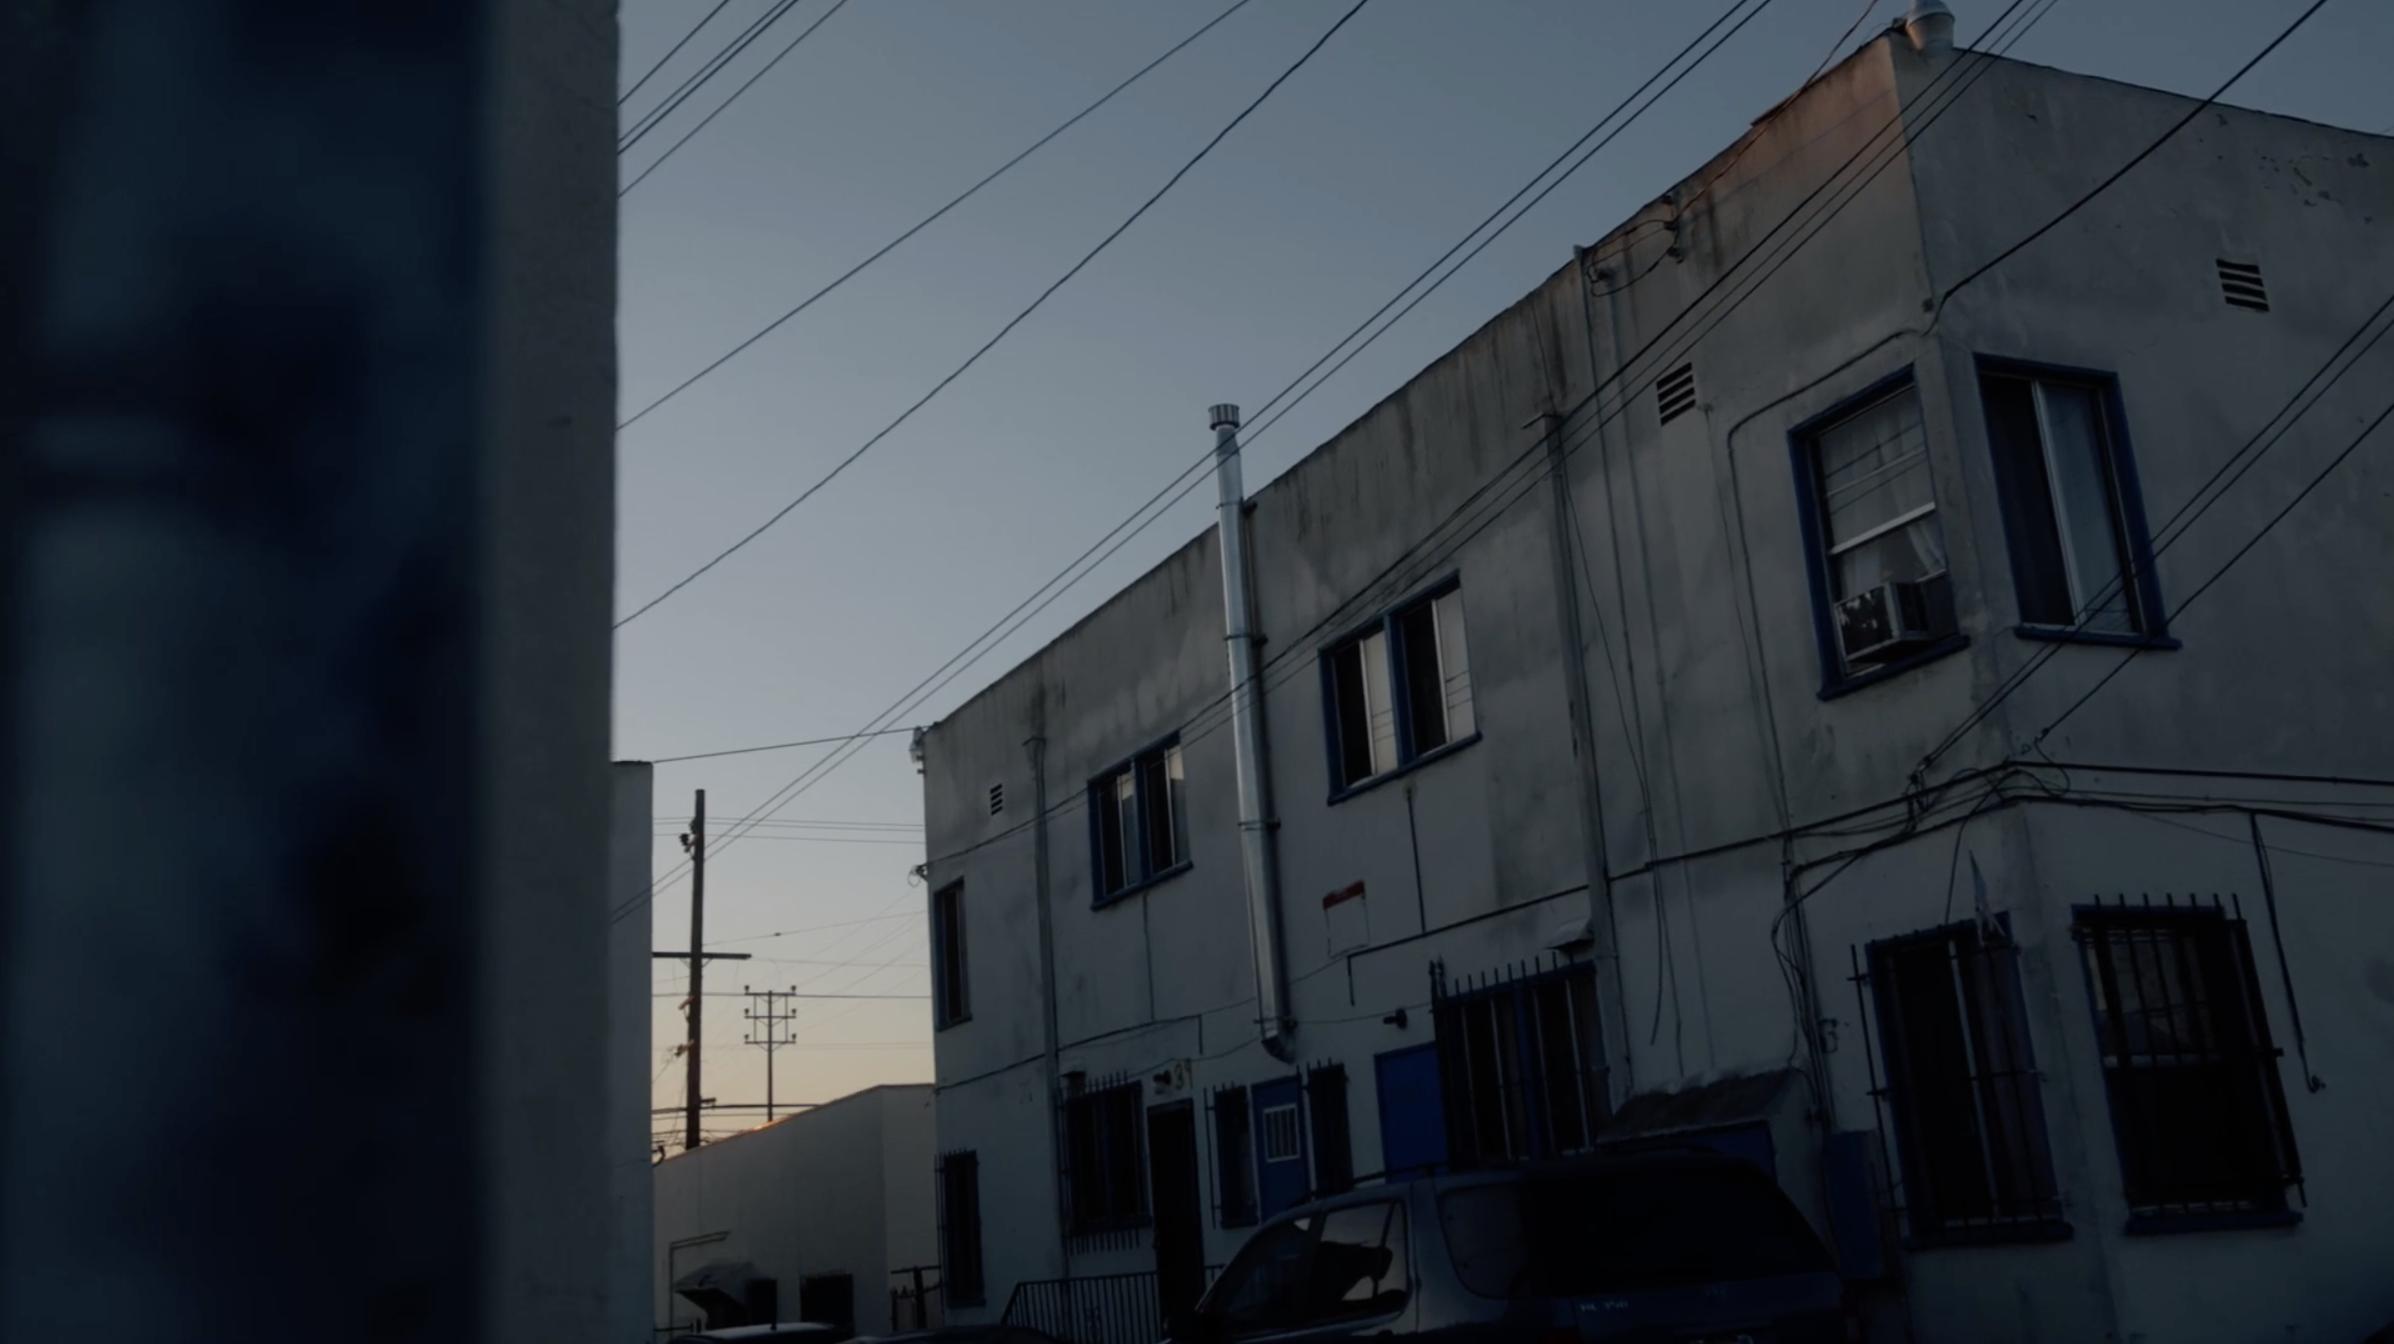 Sal's Story - Branded documentary